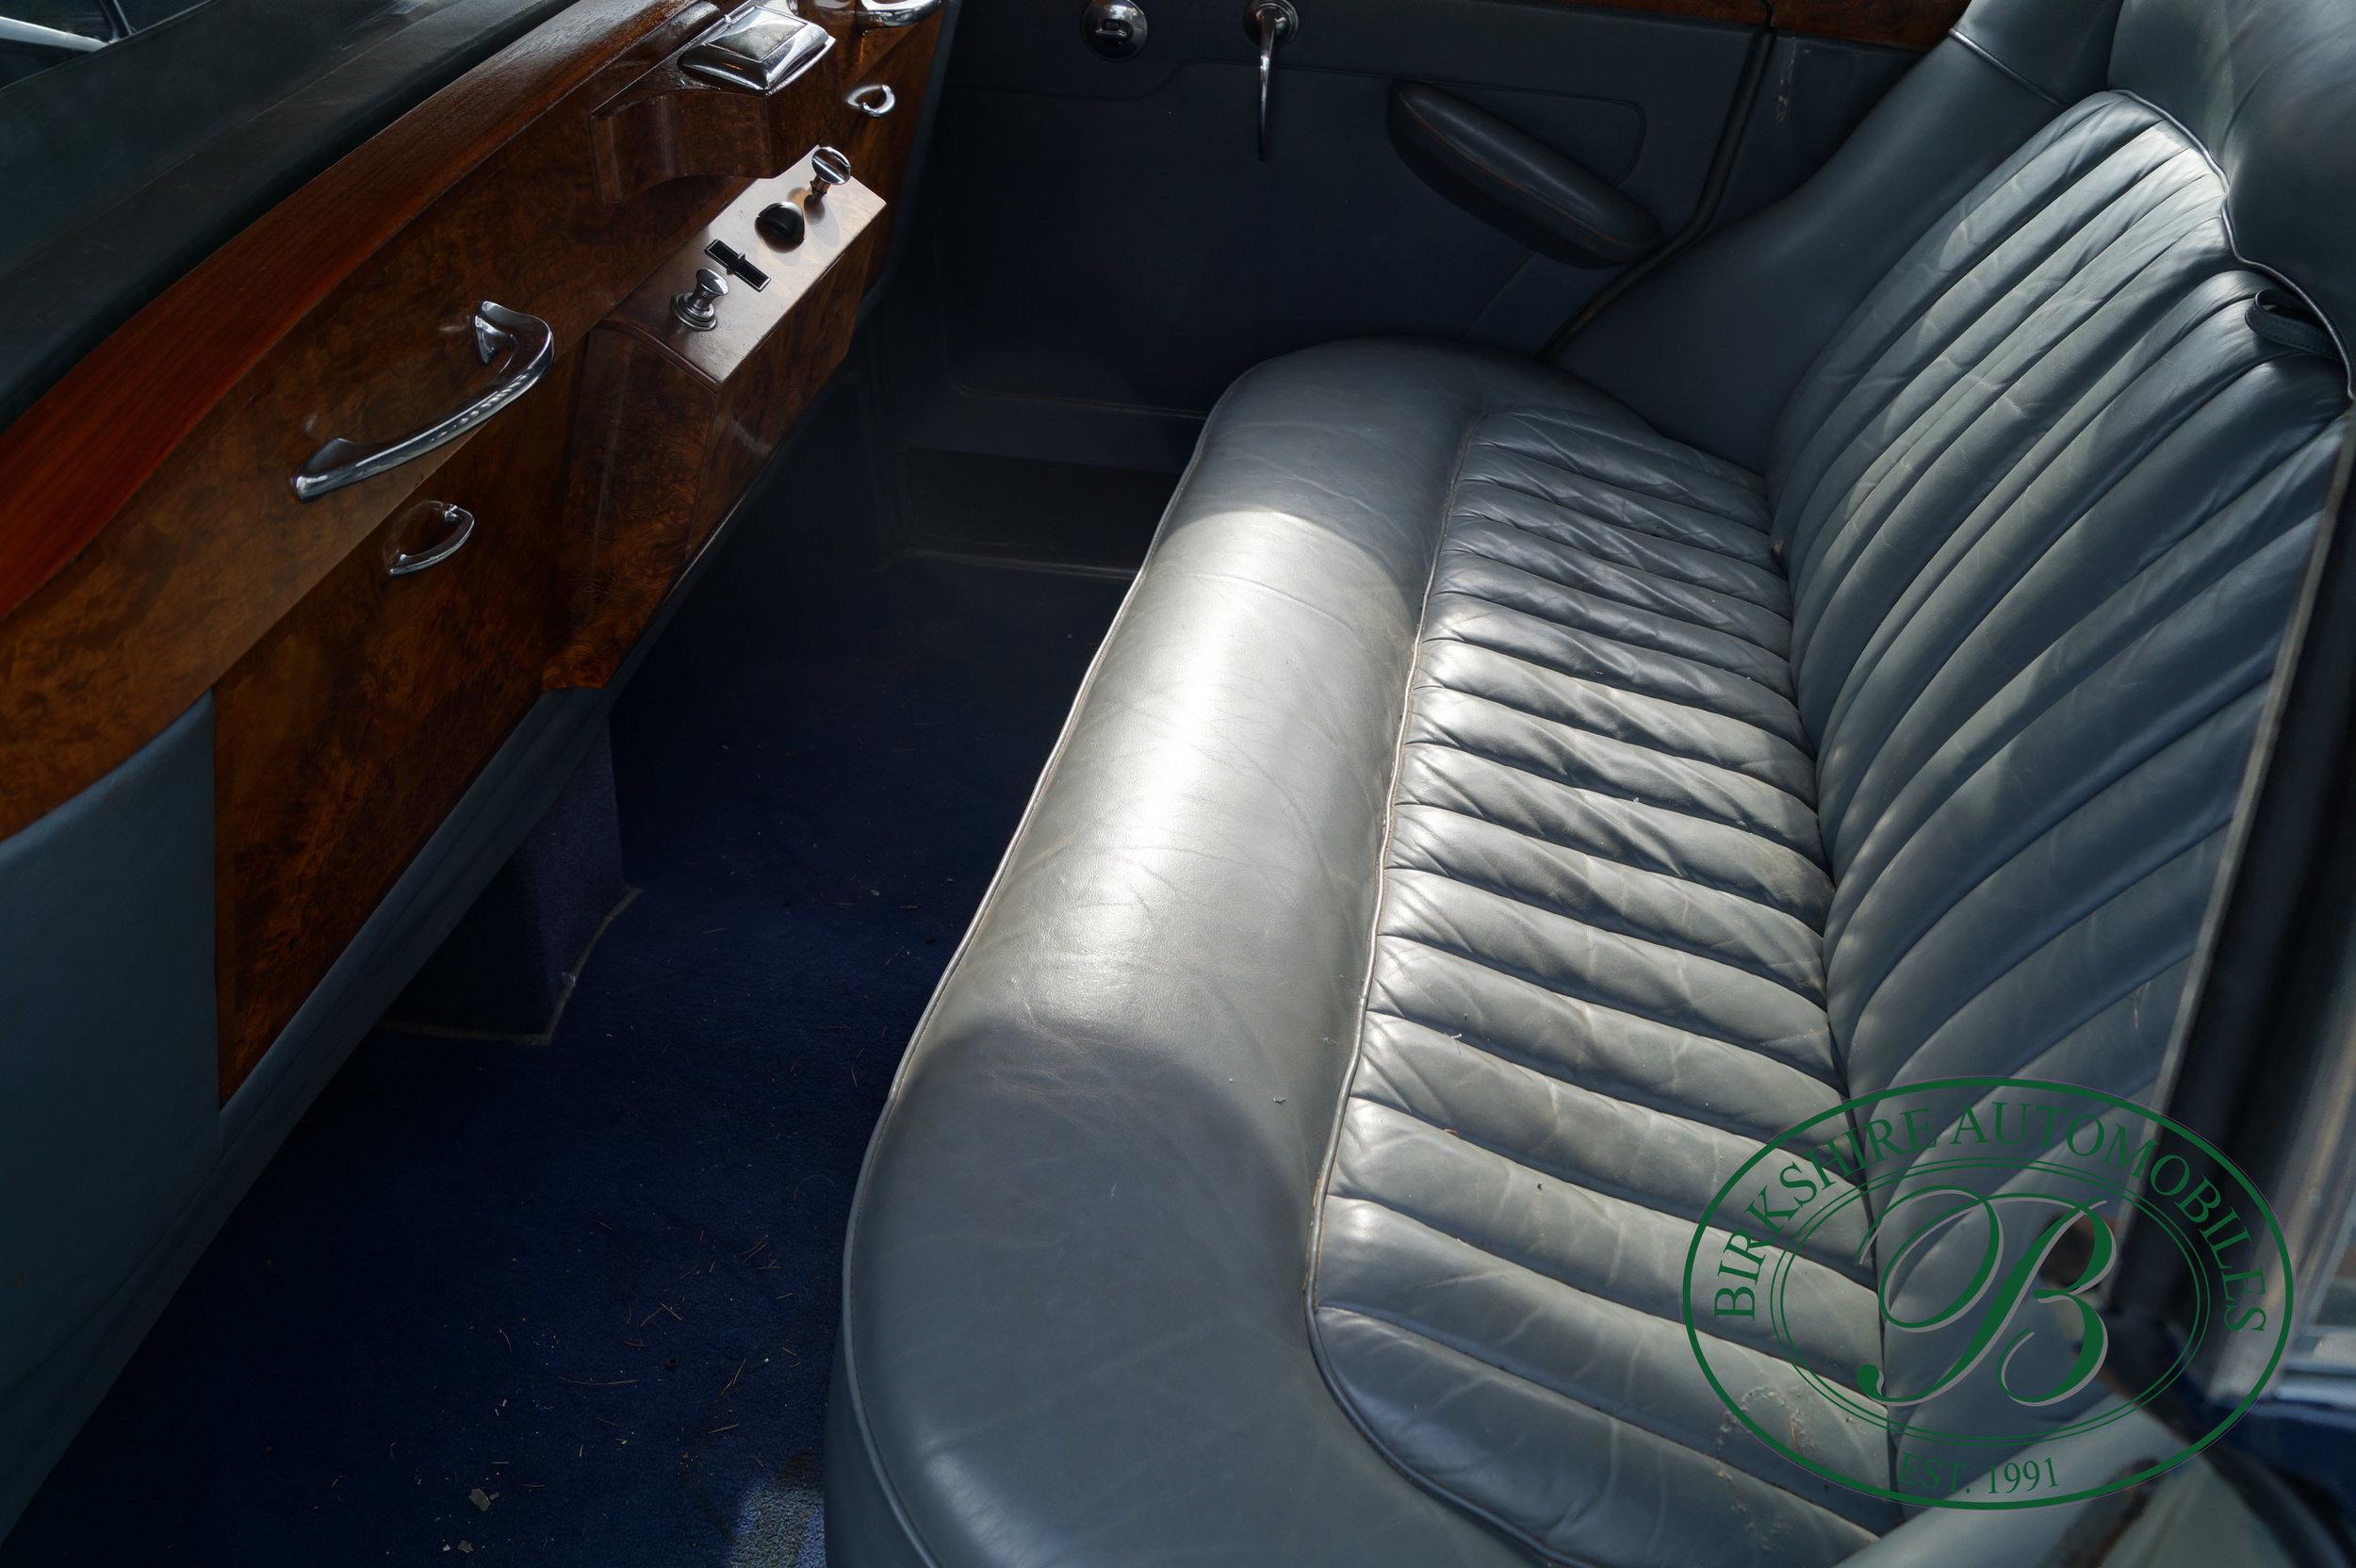 Birkshire Automobiles 1960 Rolls Royce Silver Cloud-20.jpg